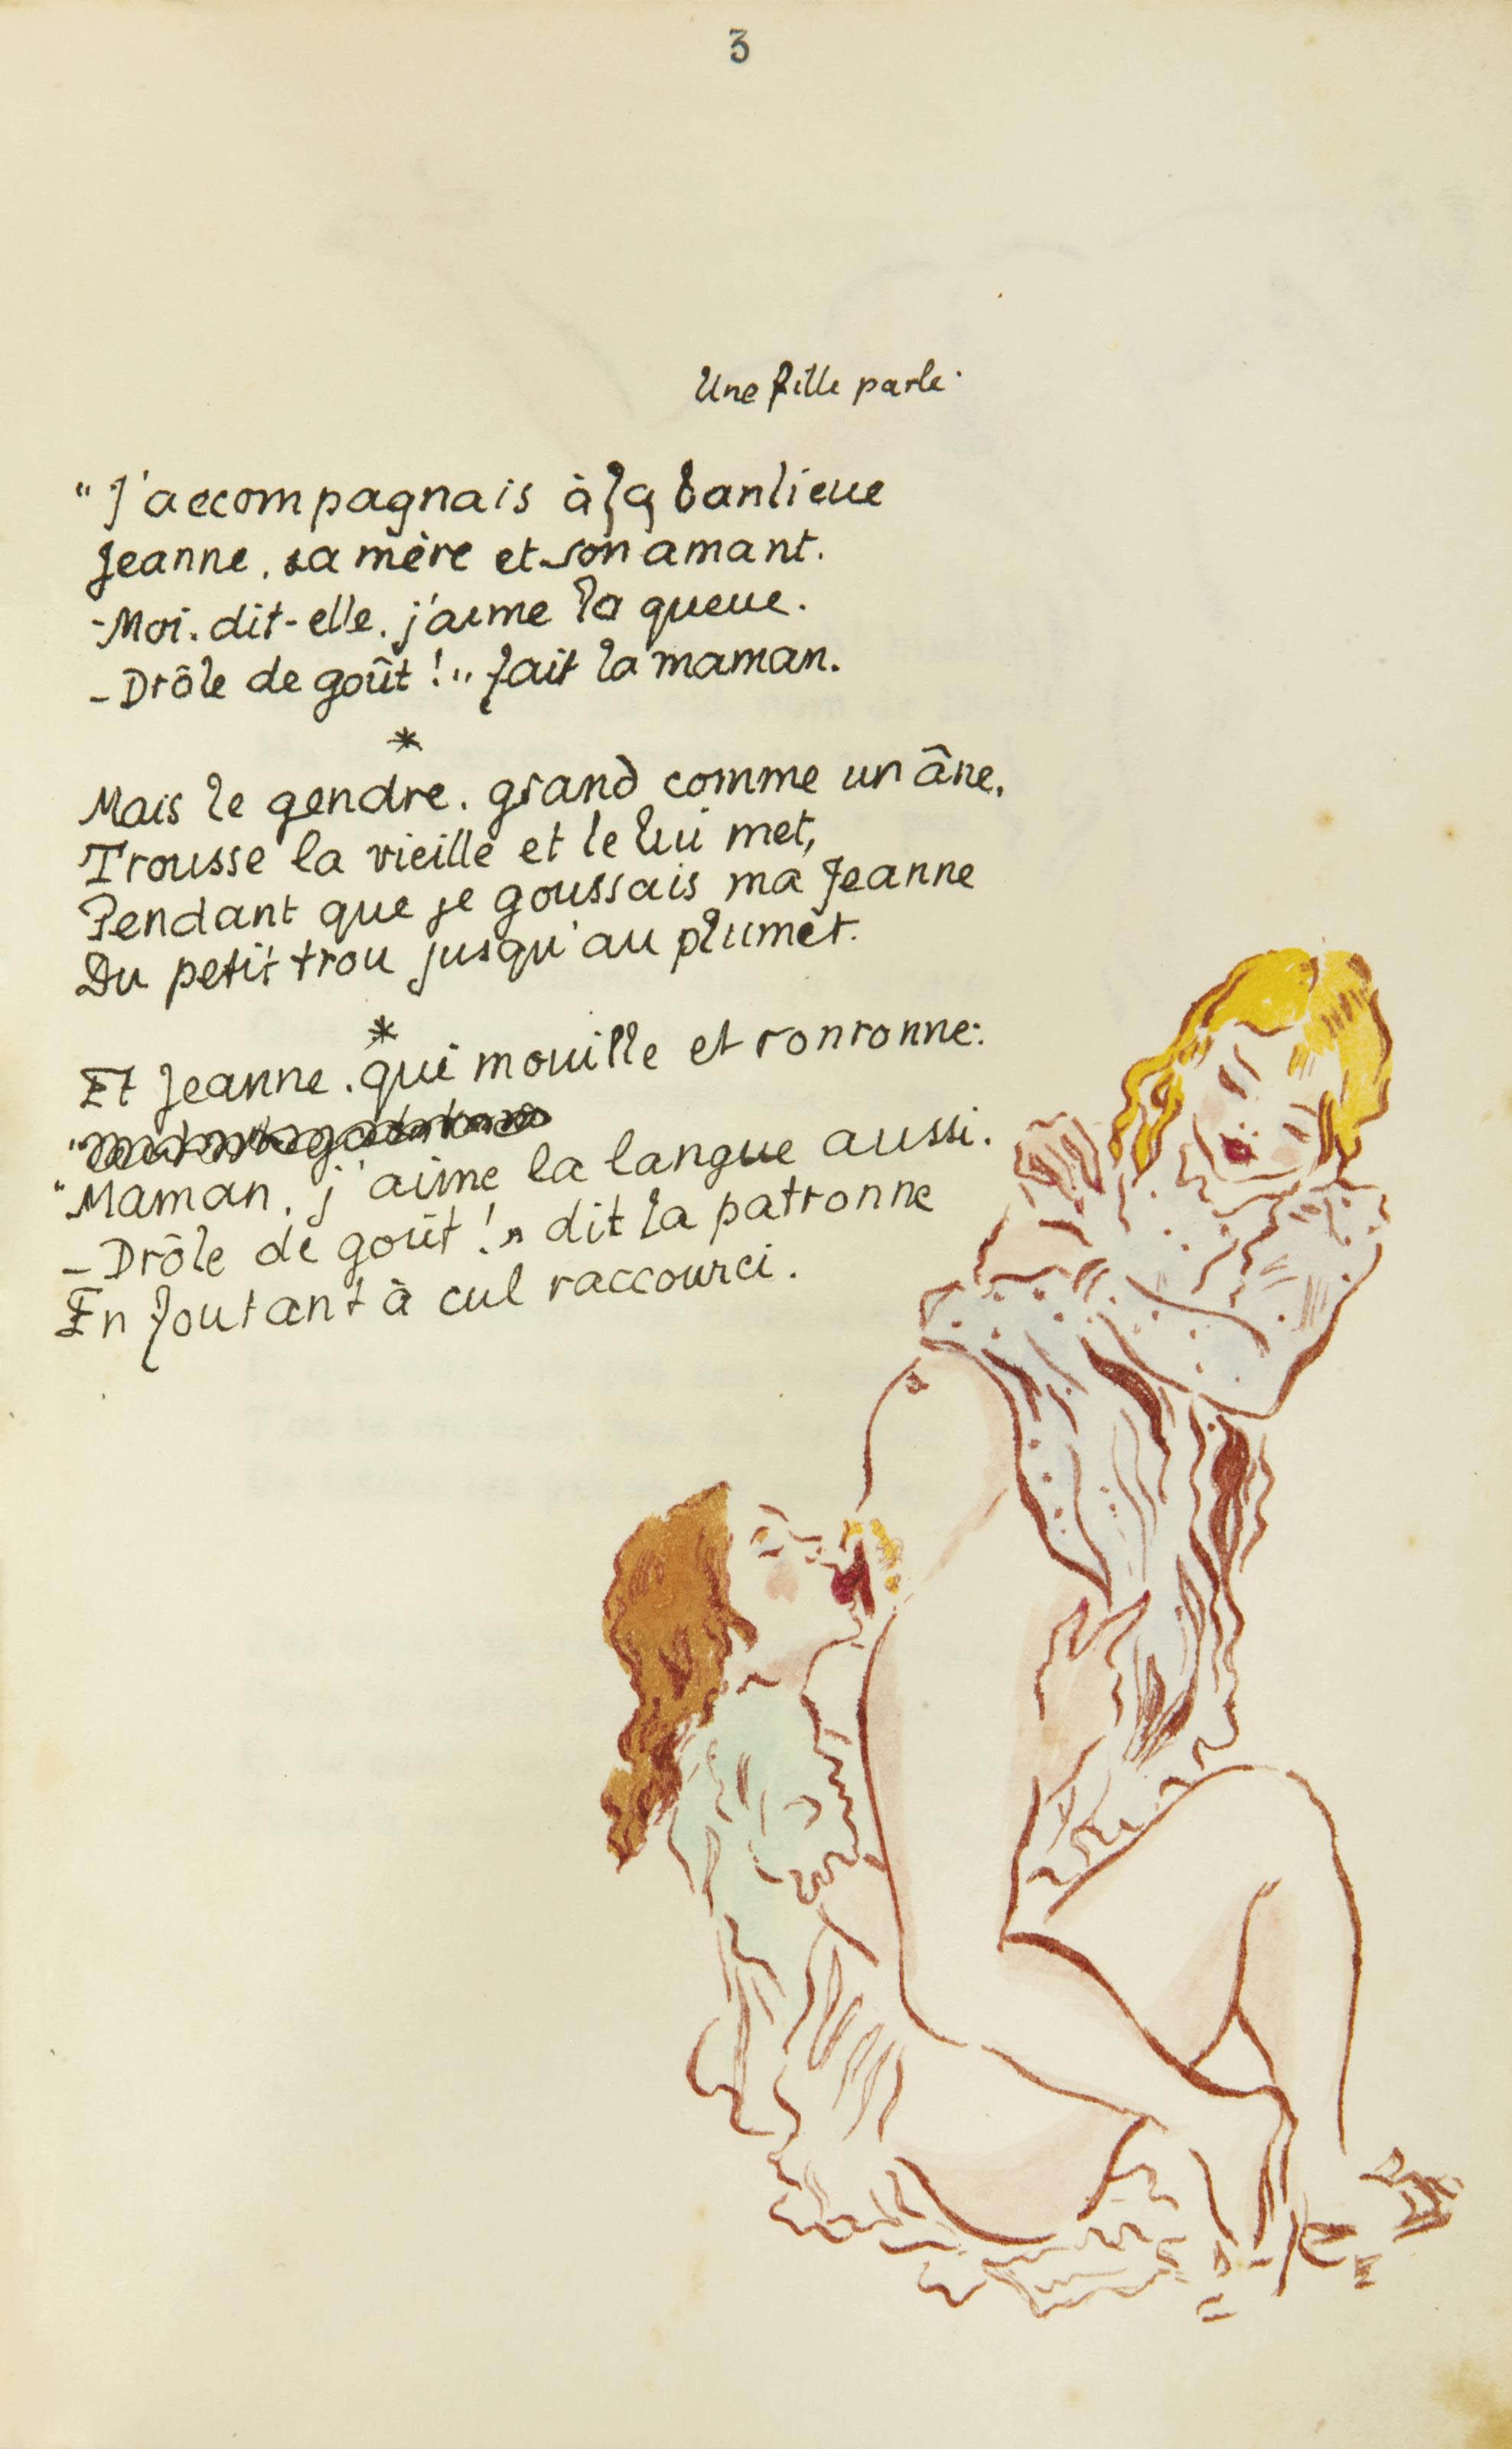 [ROJAN] -- LOUYS, Pierre (1880-1925). Poésies érotiques. S.l.n.d. [vers 1938].